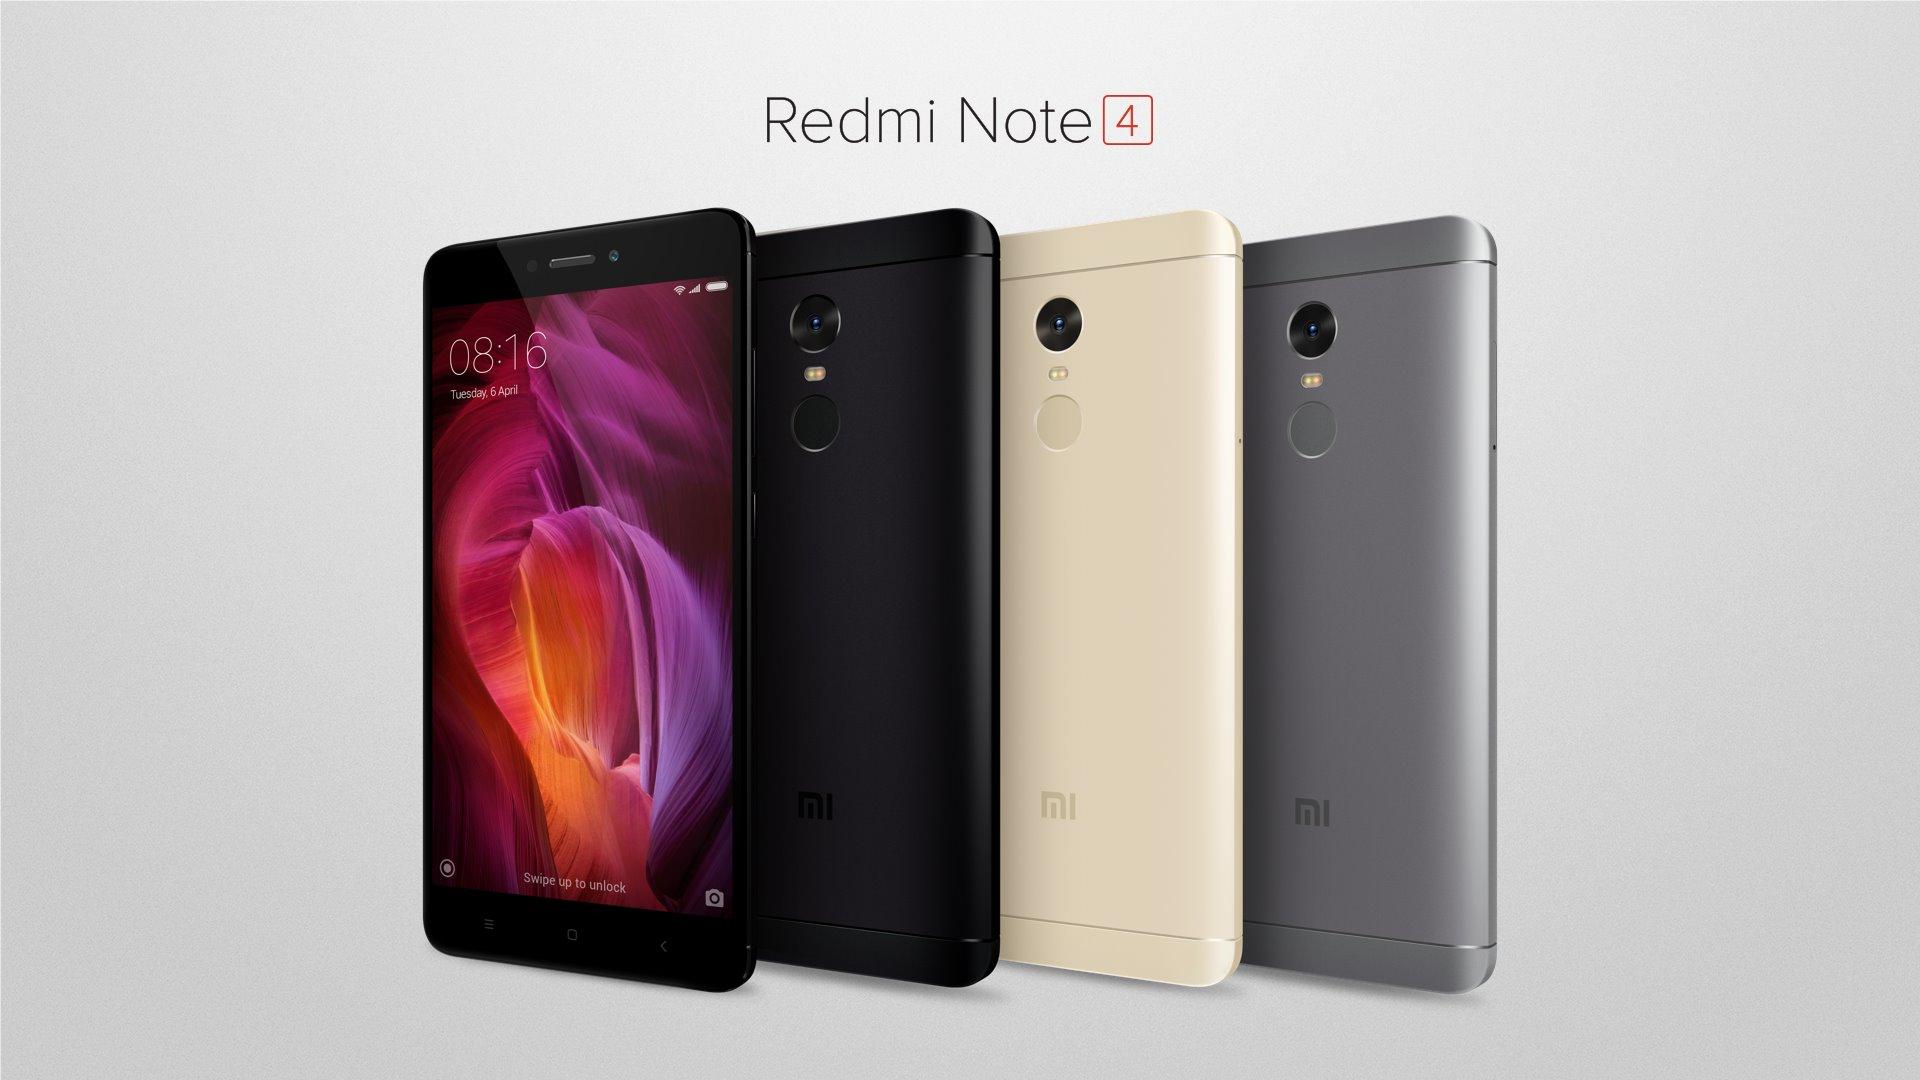 Indick½ Xiaomi Redmi Note 4 je vybaven½ Snapdragonom 625 a 4 GB RAM pamäÅ¥ou Cena začna od 137 €